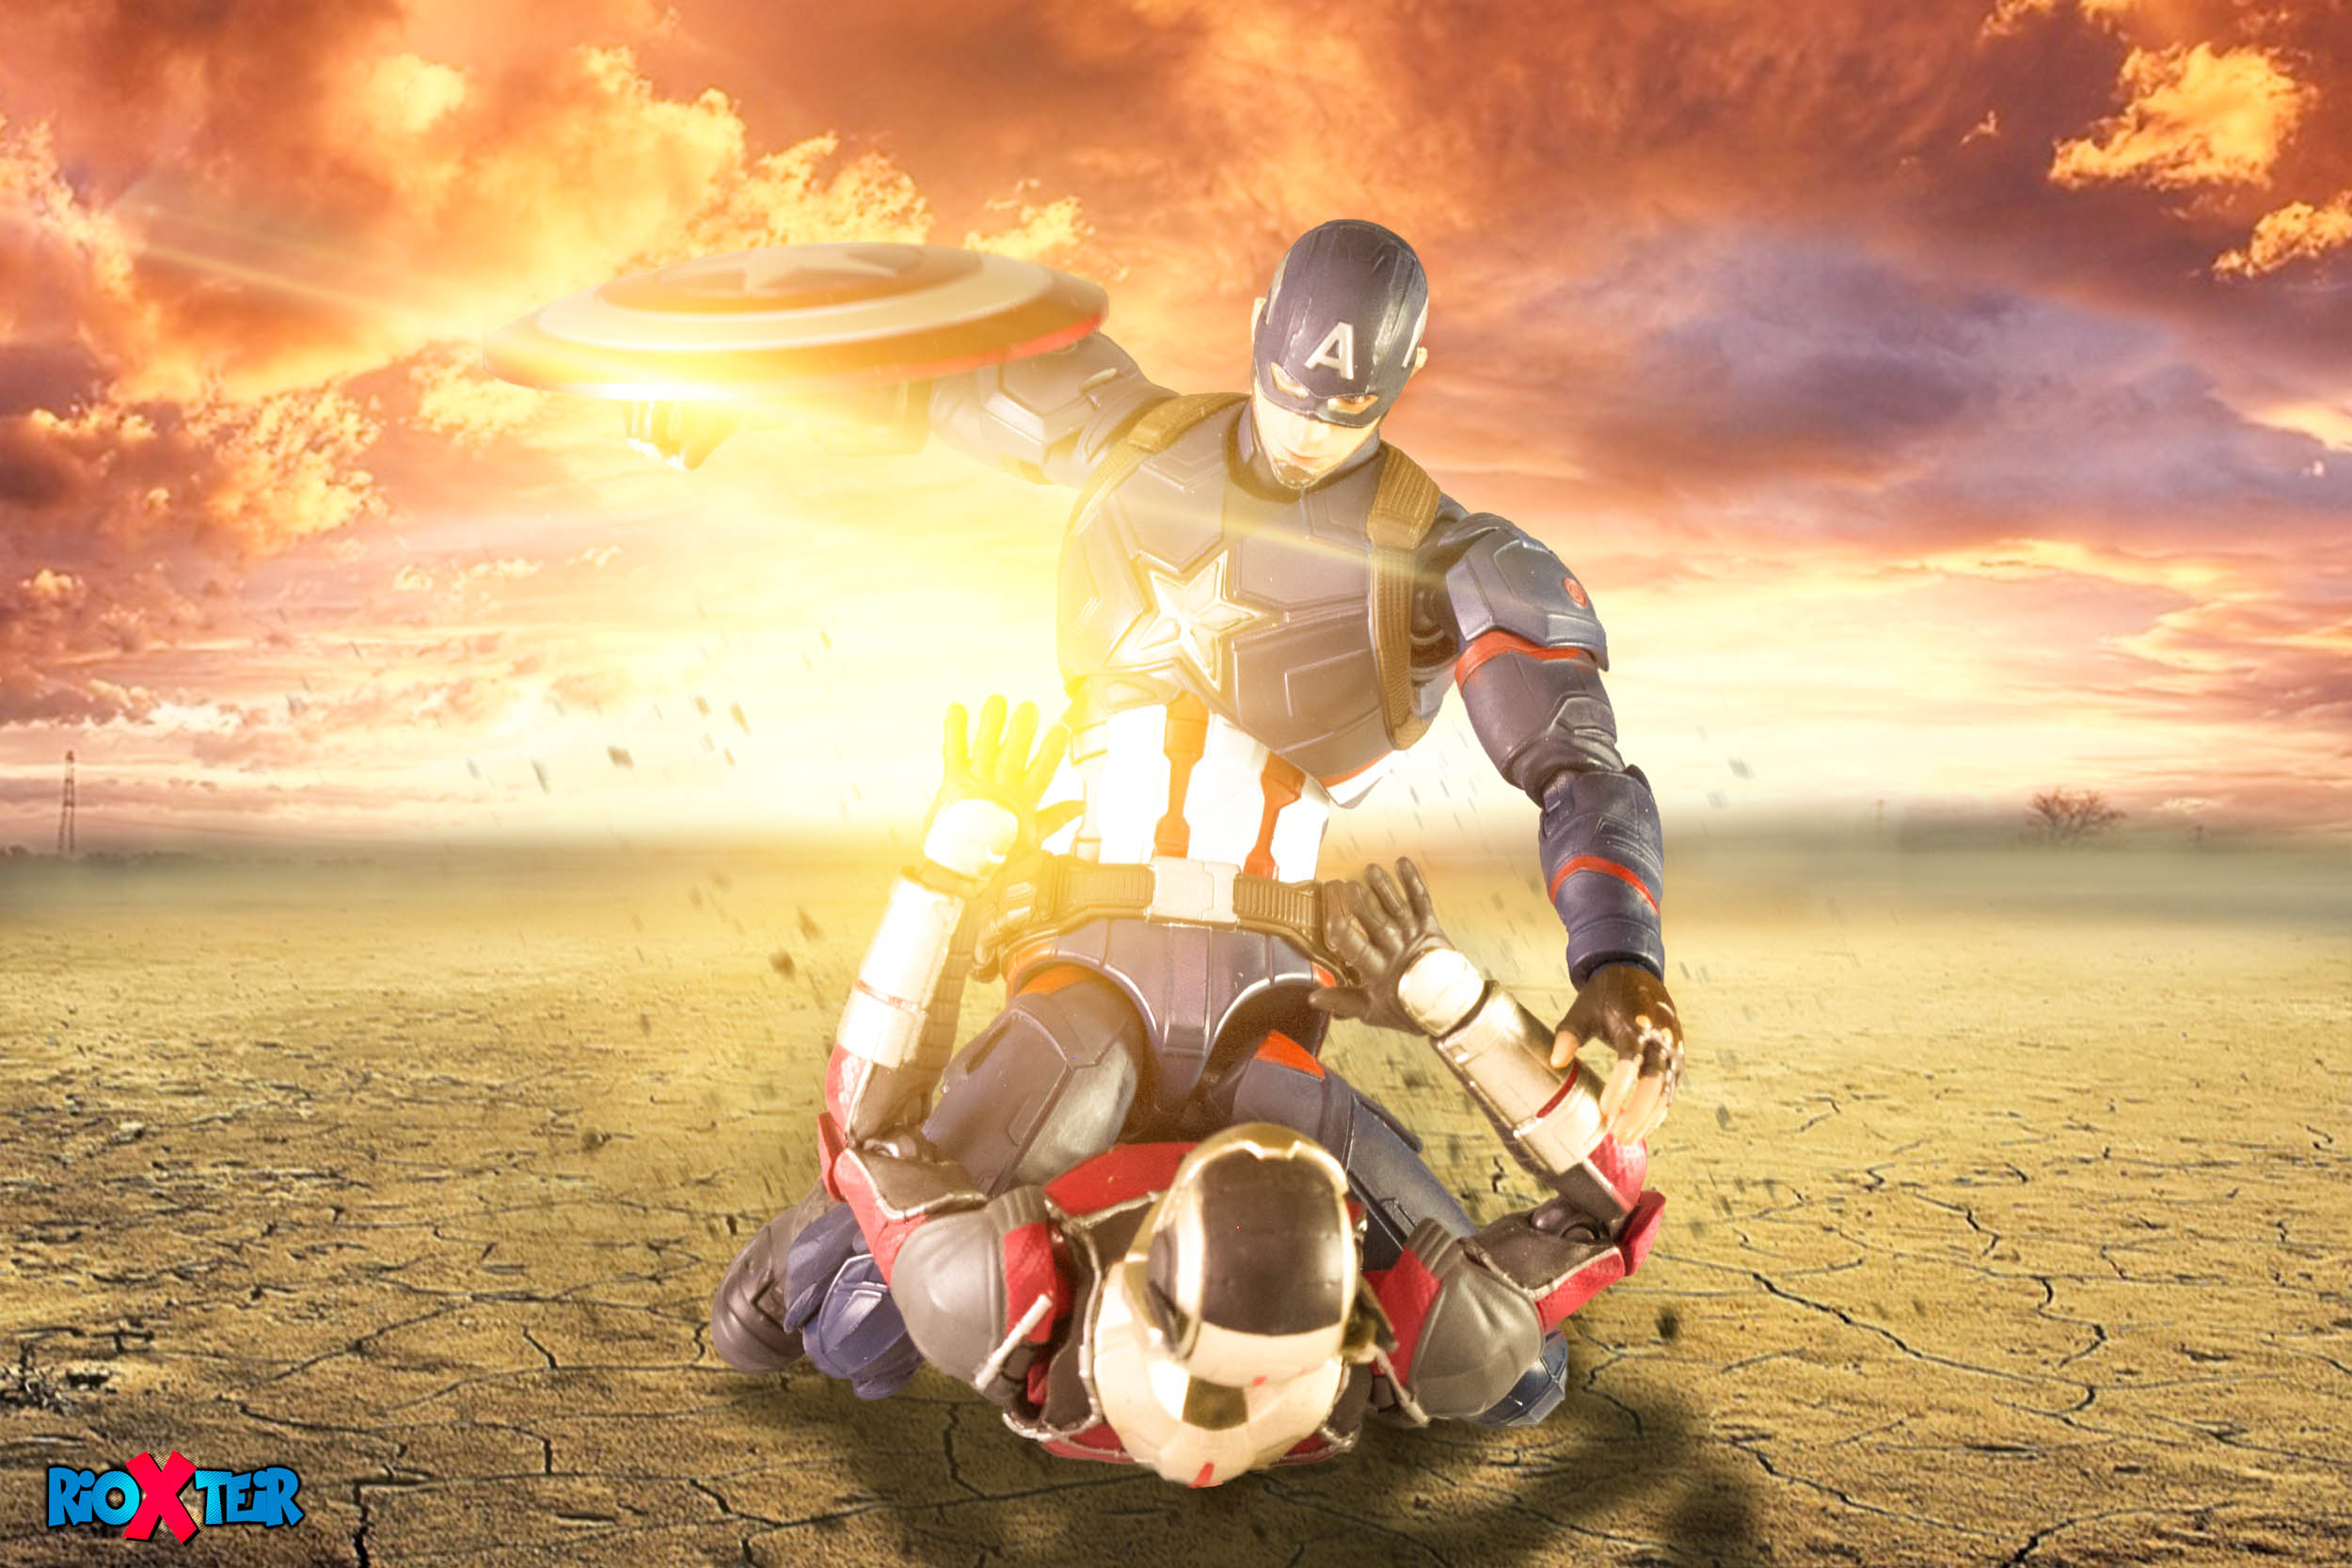 SHF Captain America fight SHF Antman